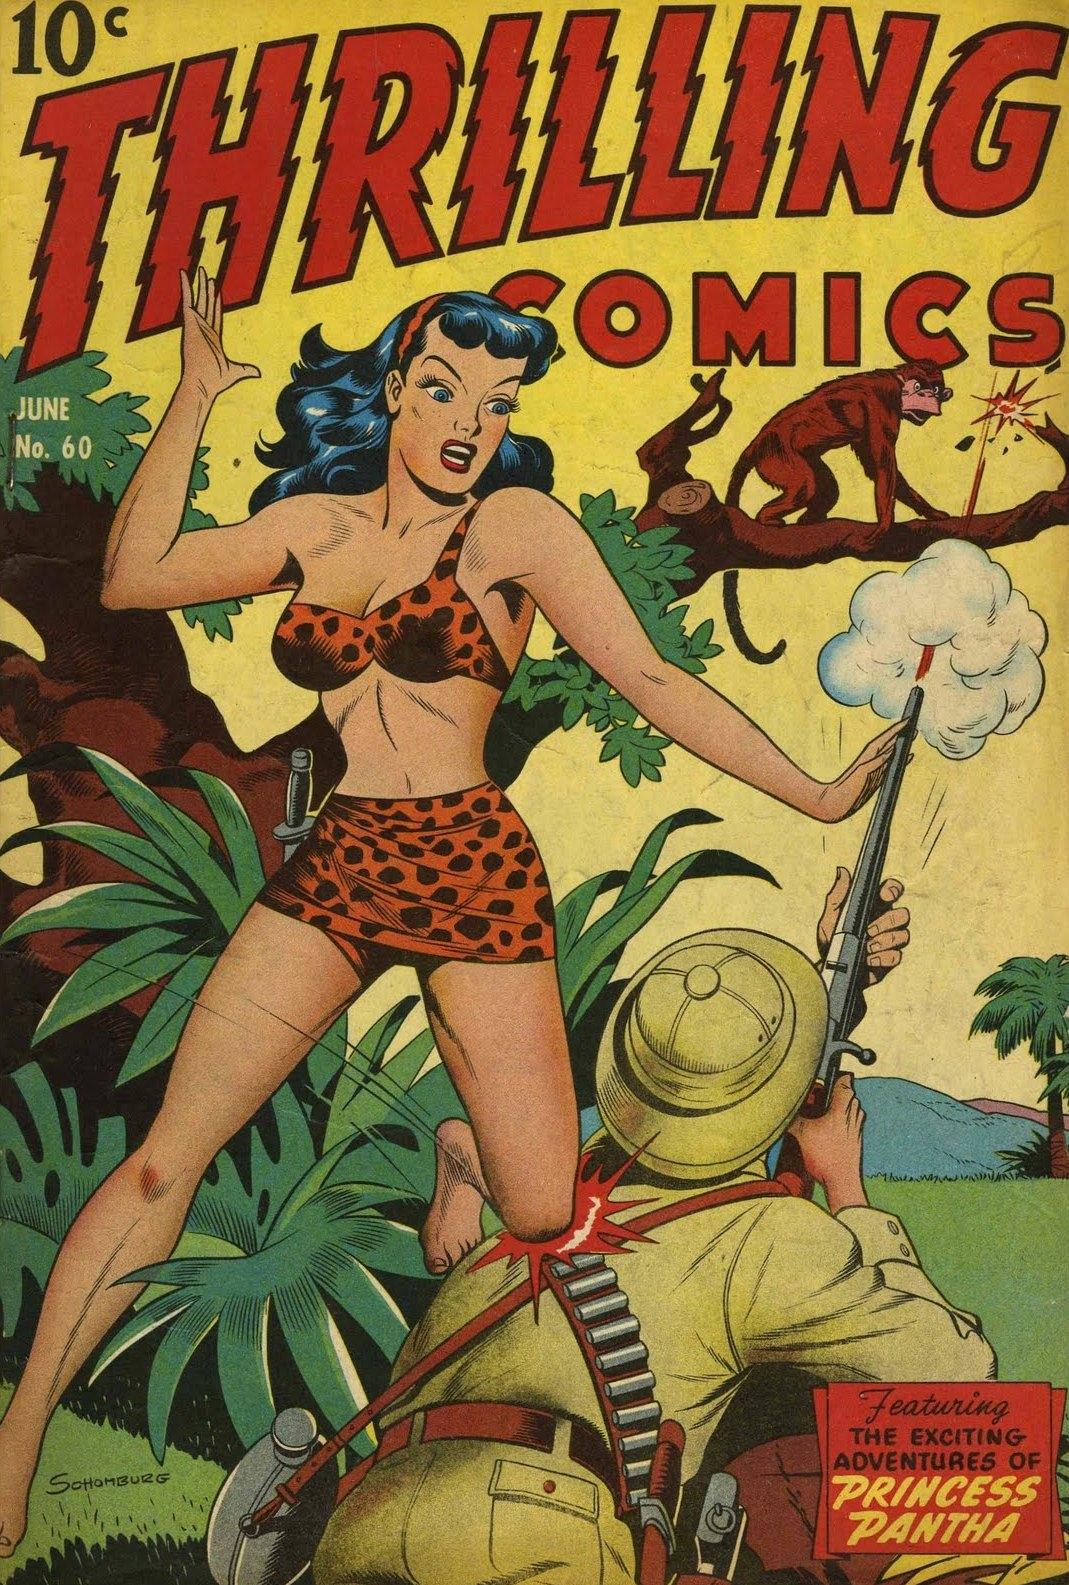 Superhero sex omics